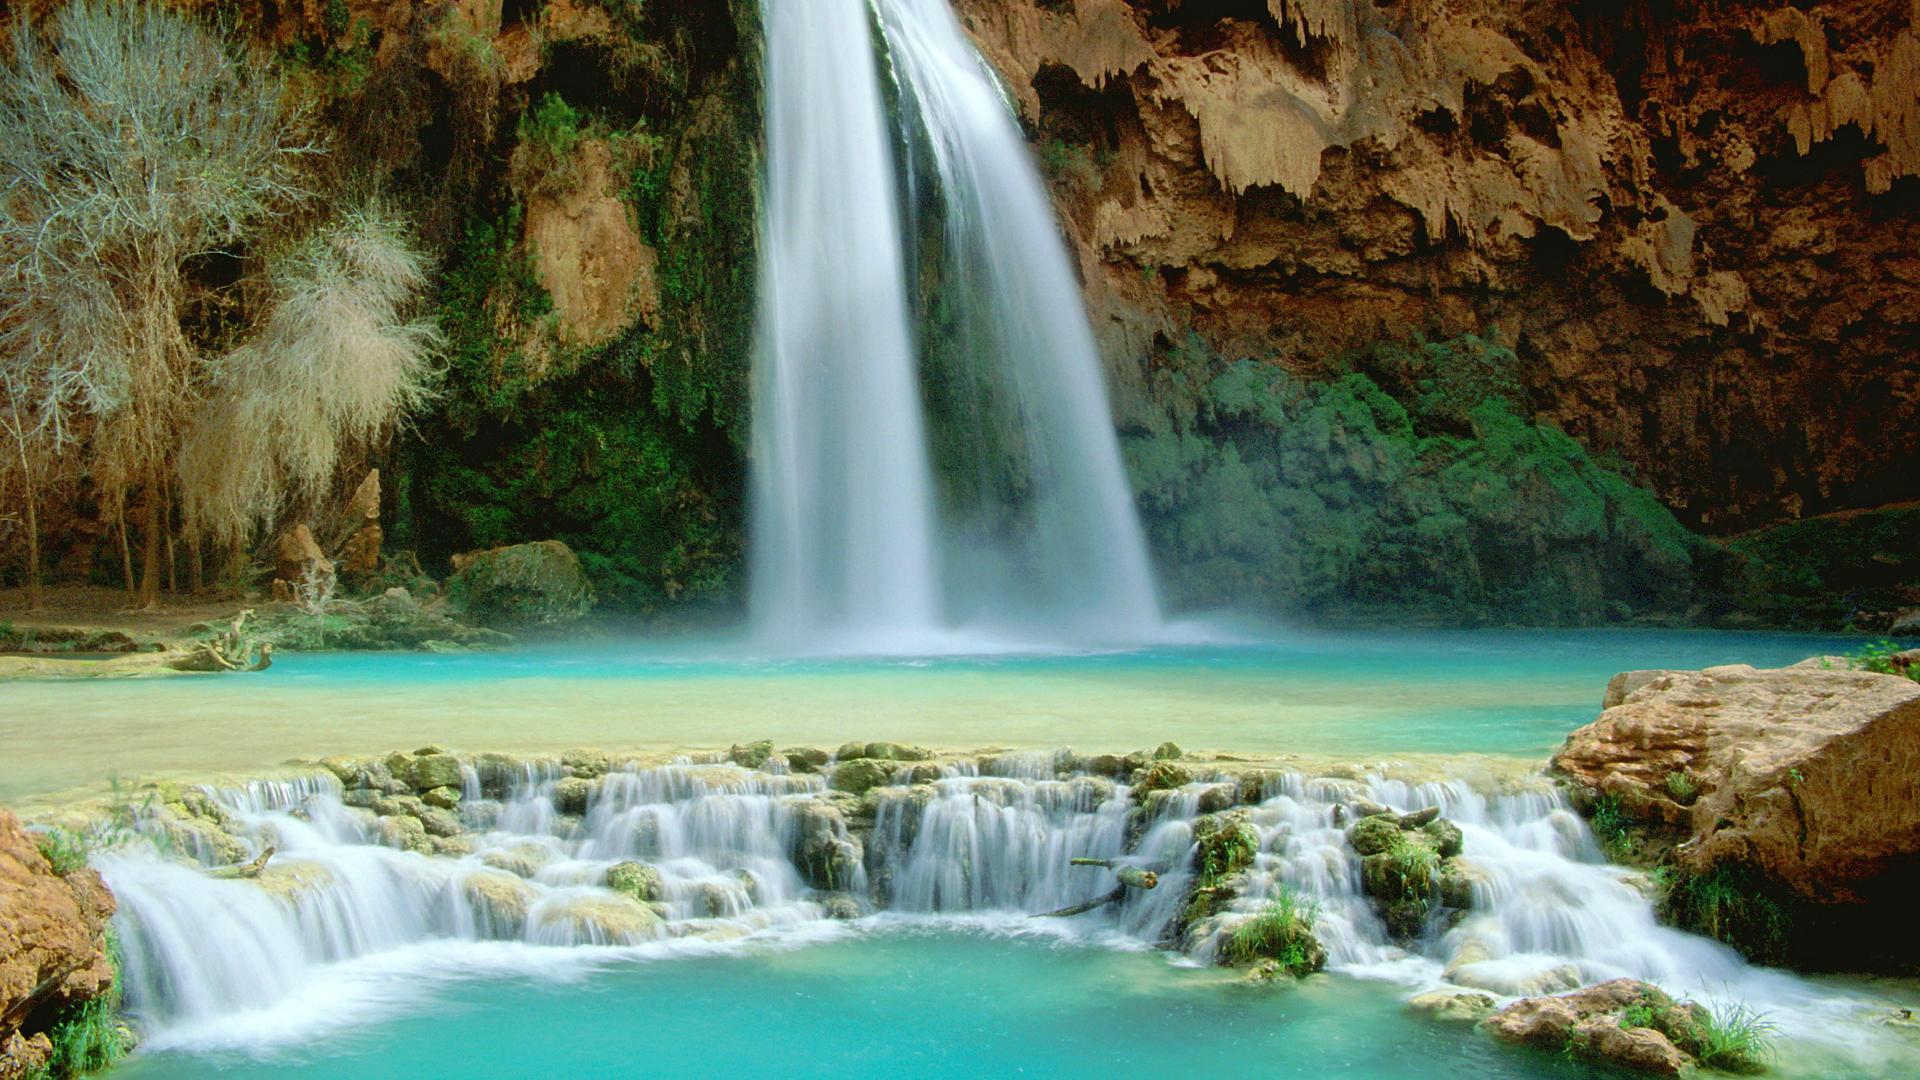 Waterfall Hd Wallpaper Background Image 1920x1080 Id